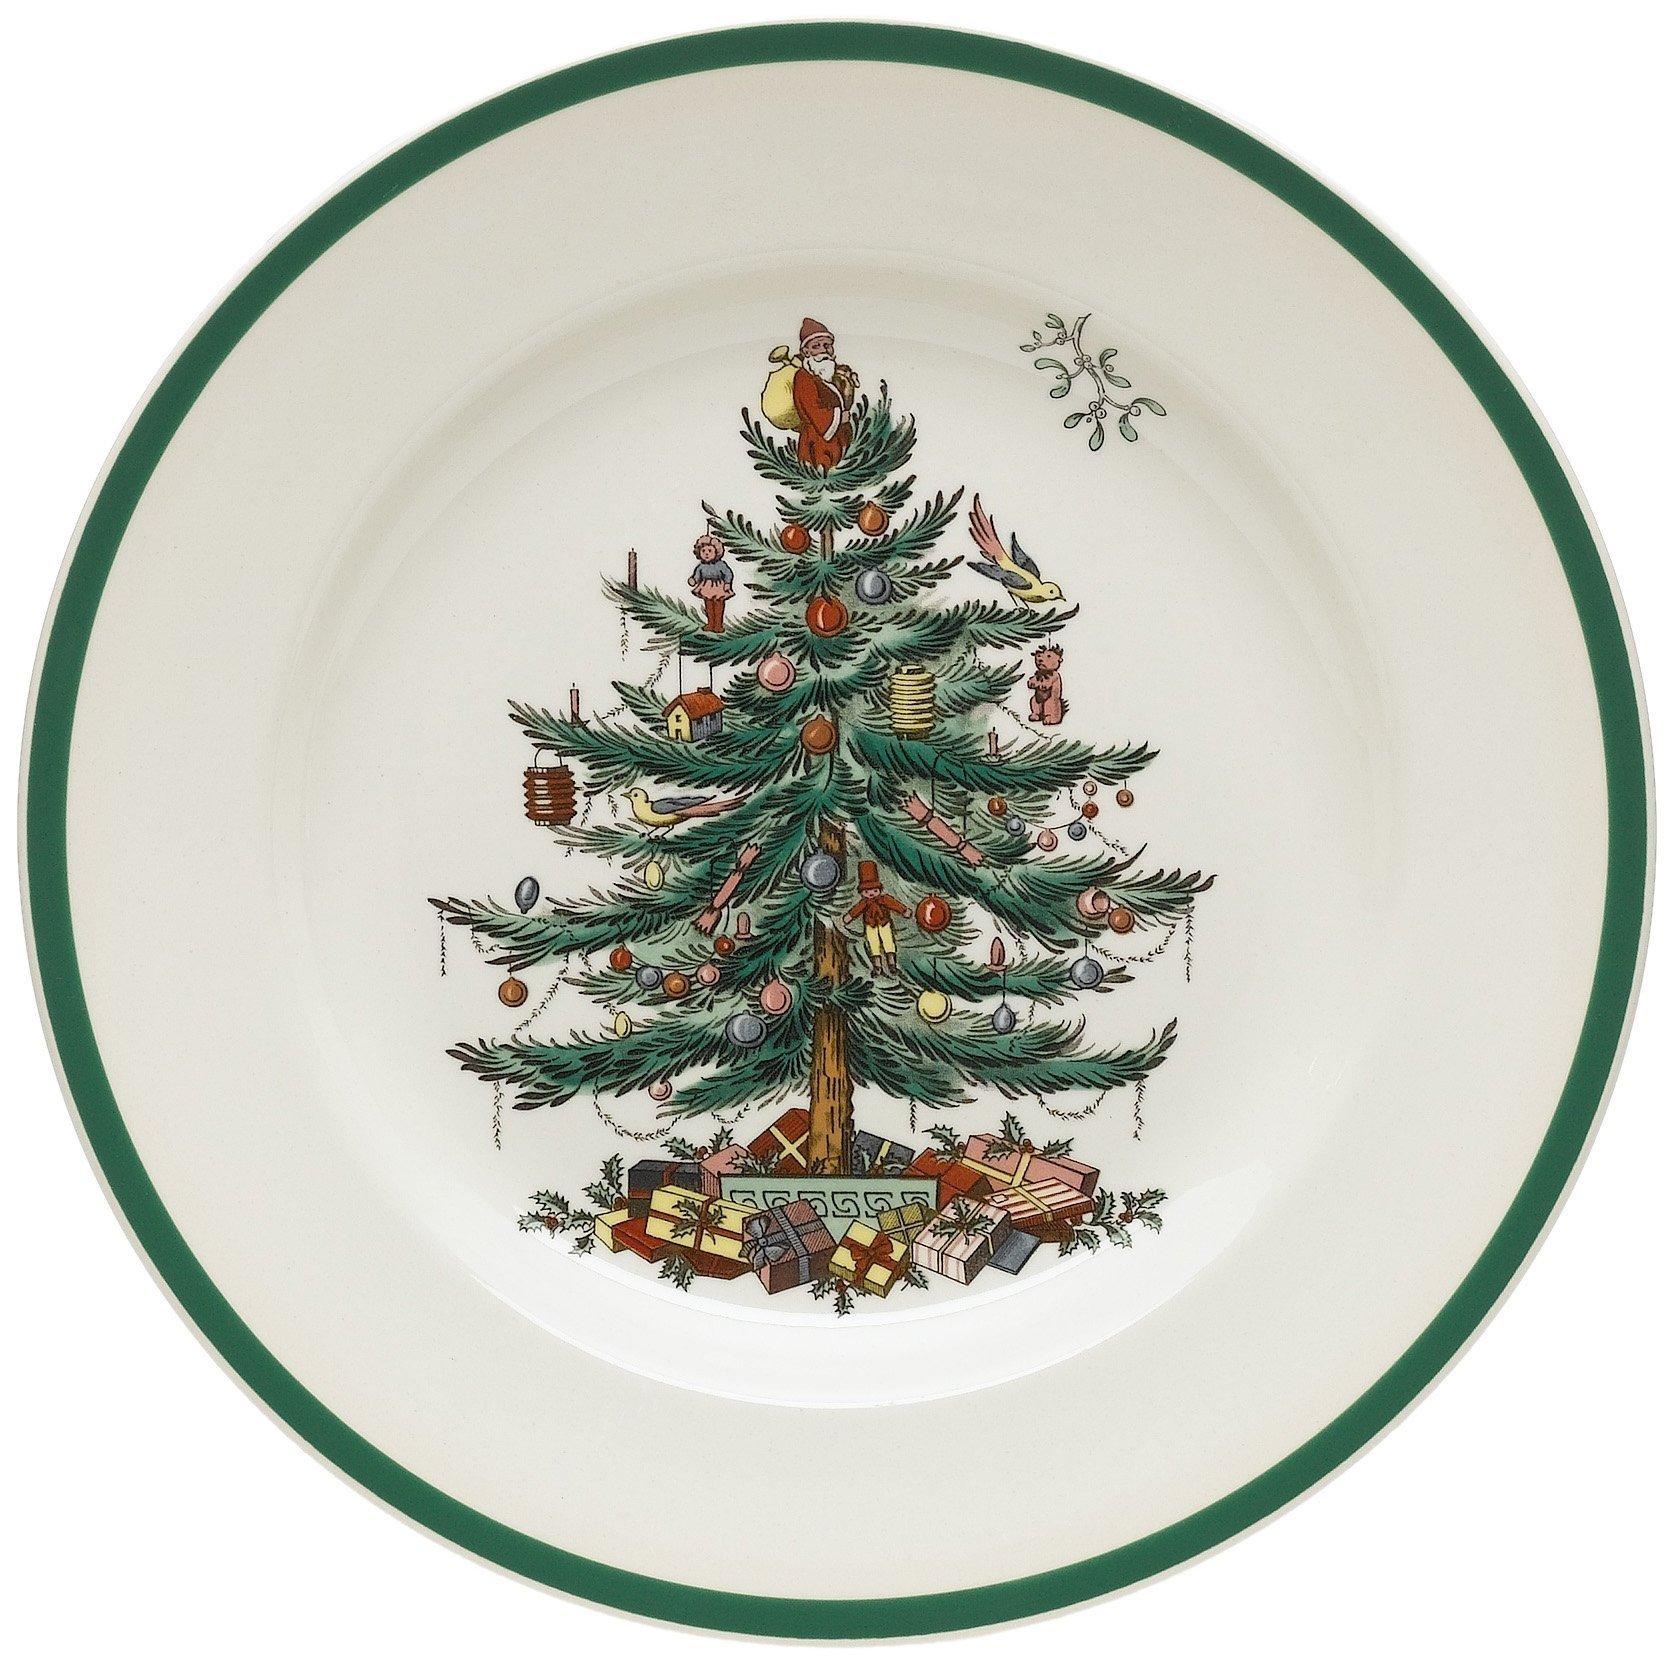 Spode Christmas Tree 10-1/2-Inch Dinner Plates, Set of 4